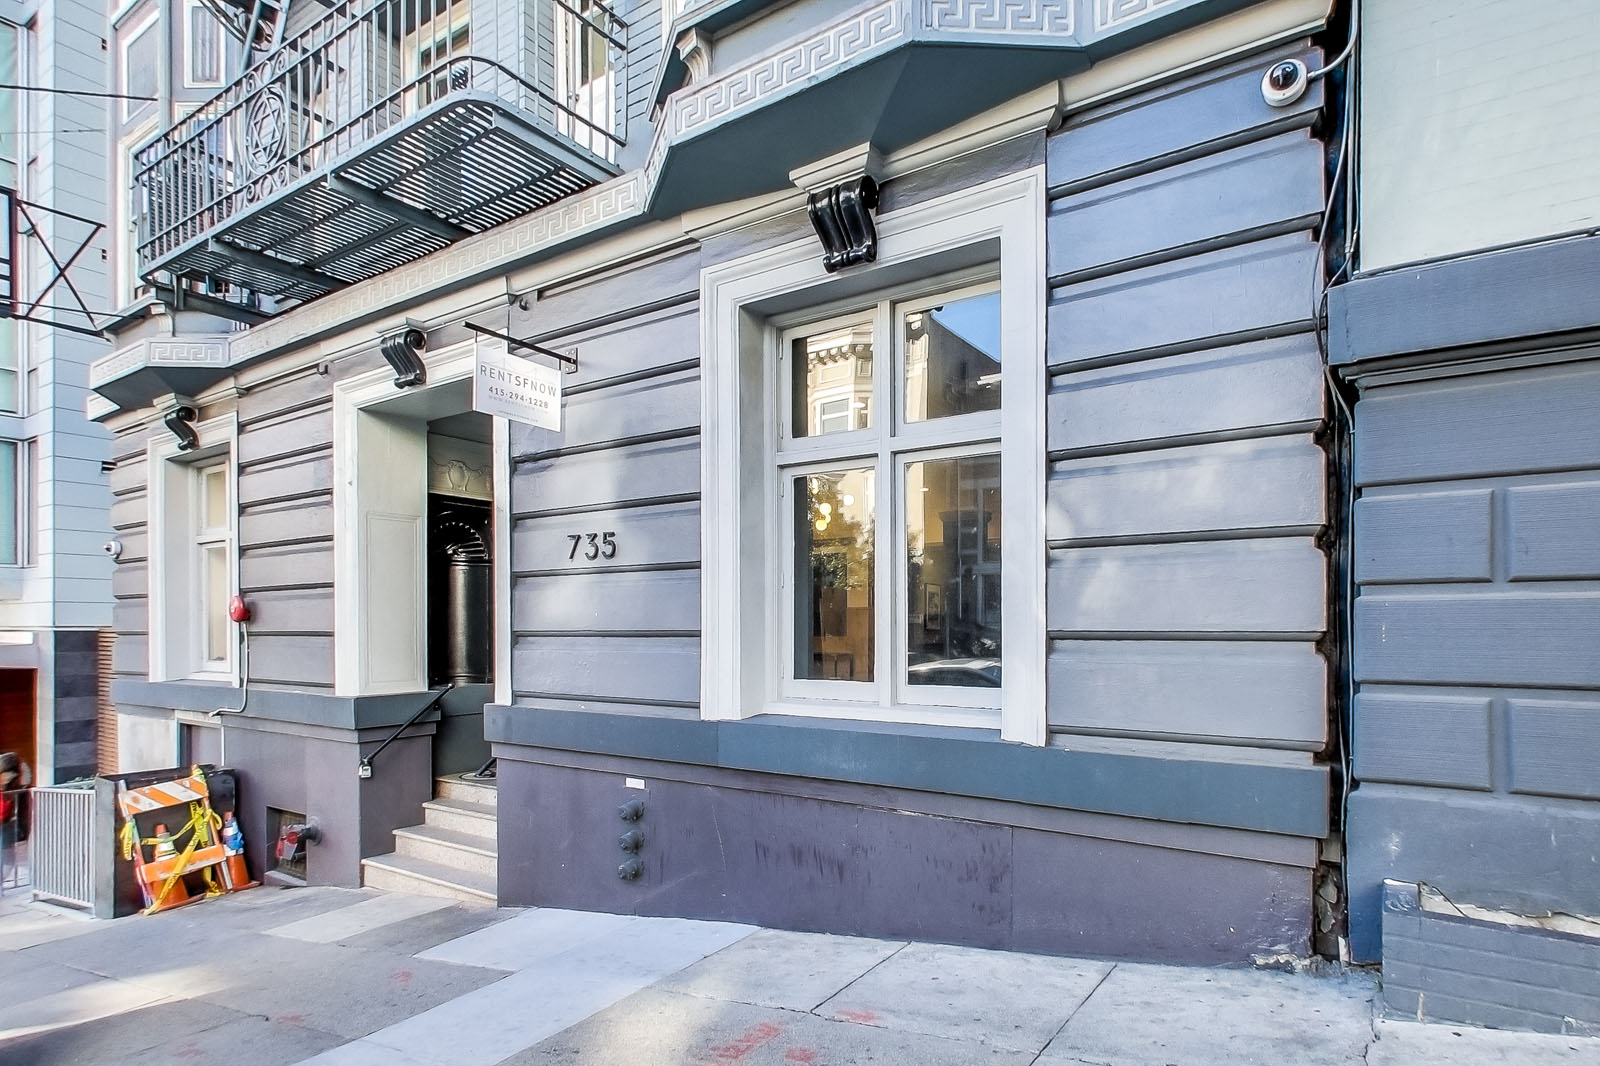 735 TAYLOR   Apartments In San Francisco, CA Via 735taylor.com